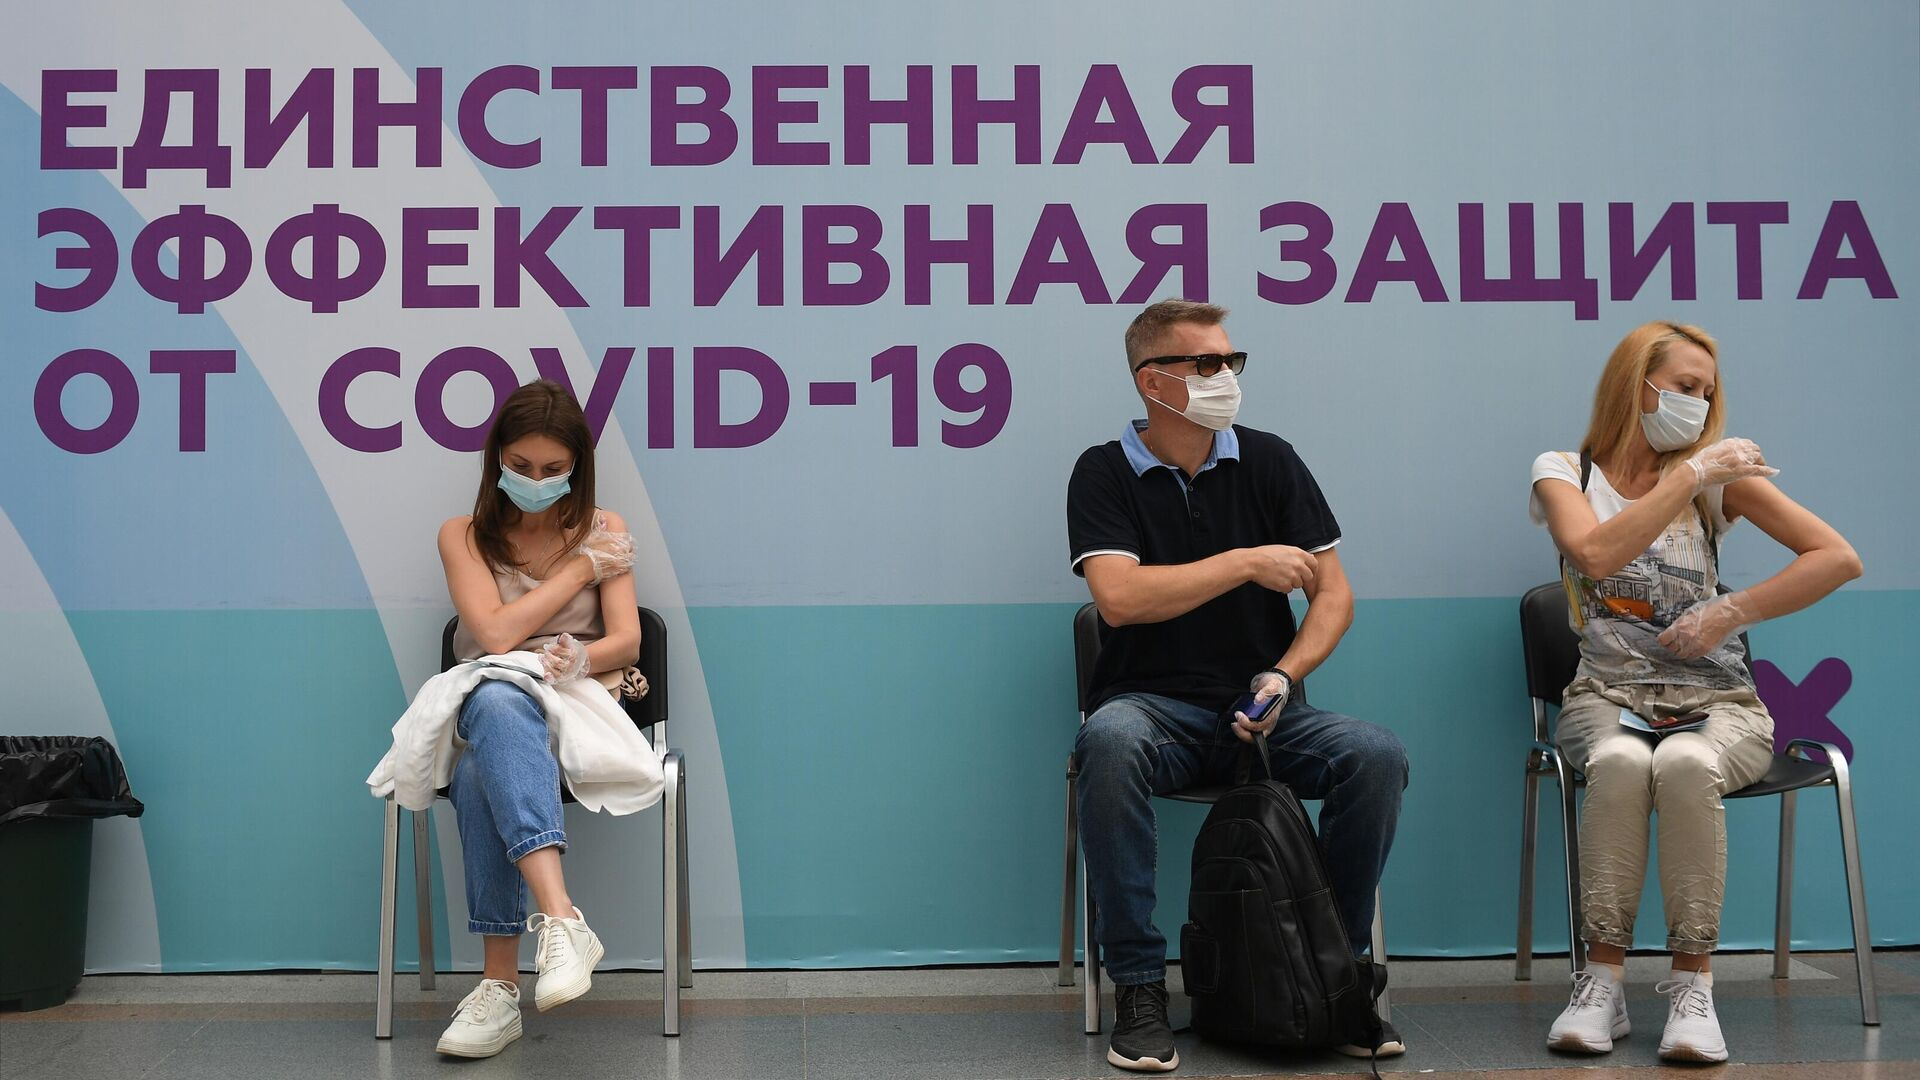 Посетители в центре вакцинации от COVID-19 в Гостином дворе в Москве - РИА Новости, 1920, 18.09.2021